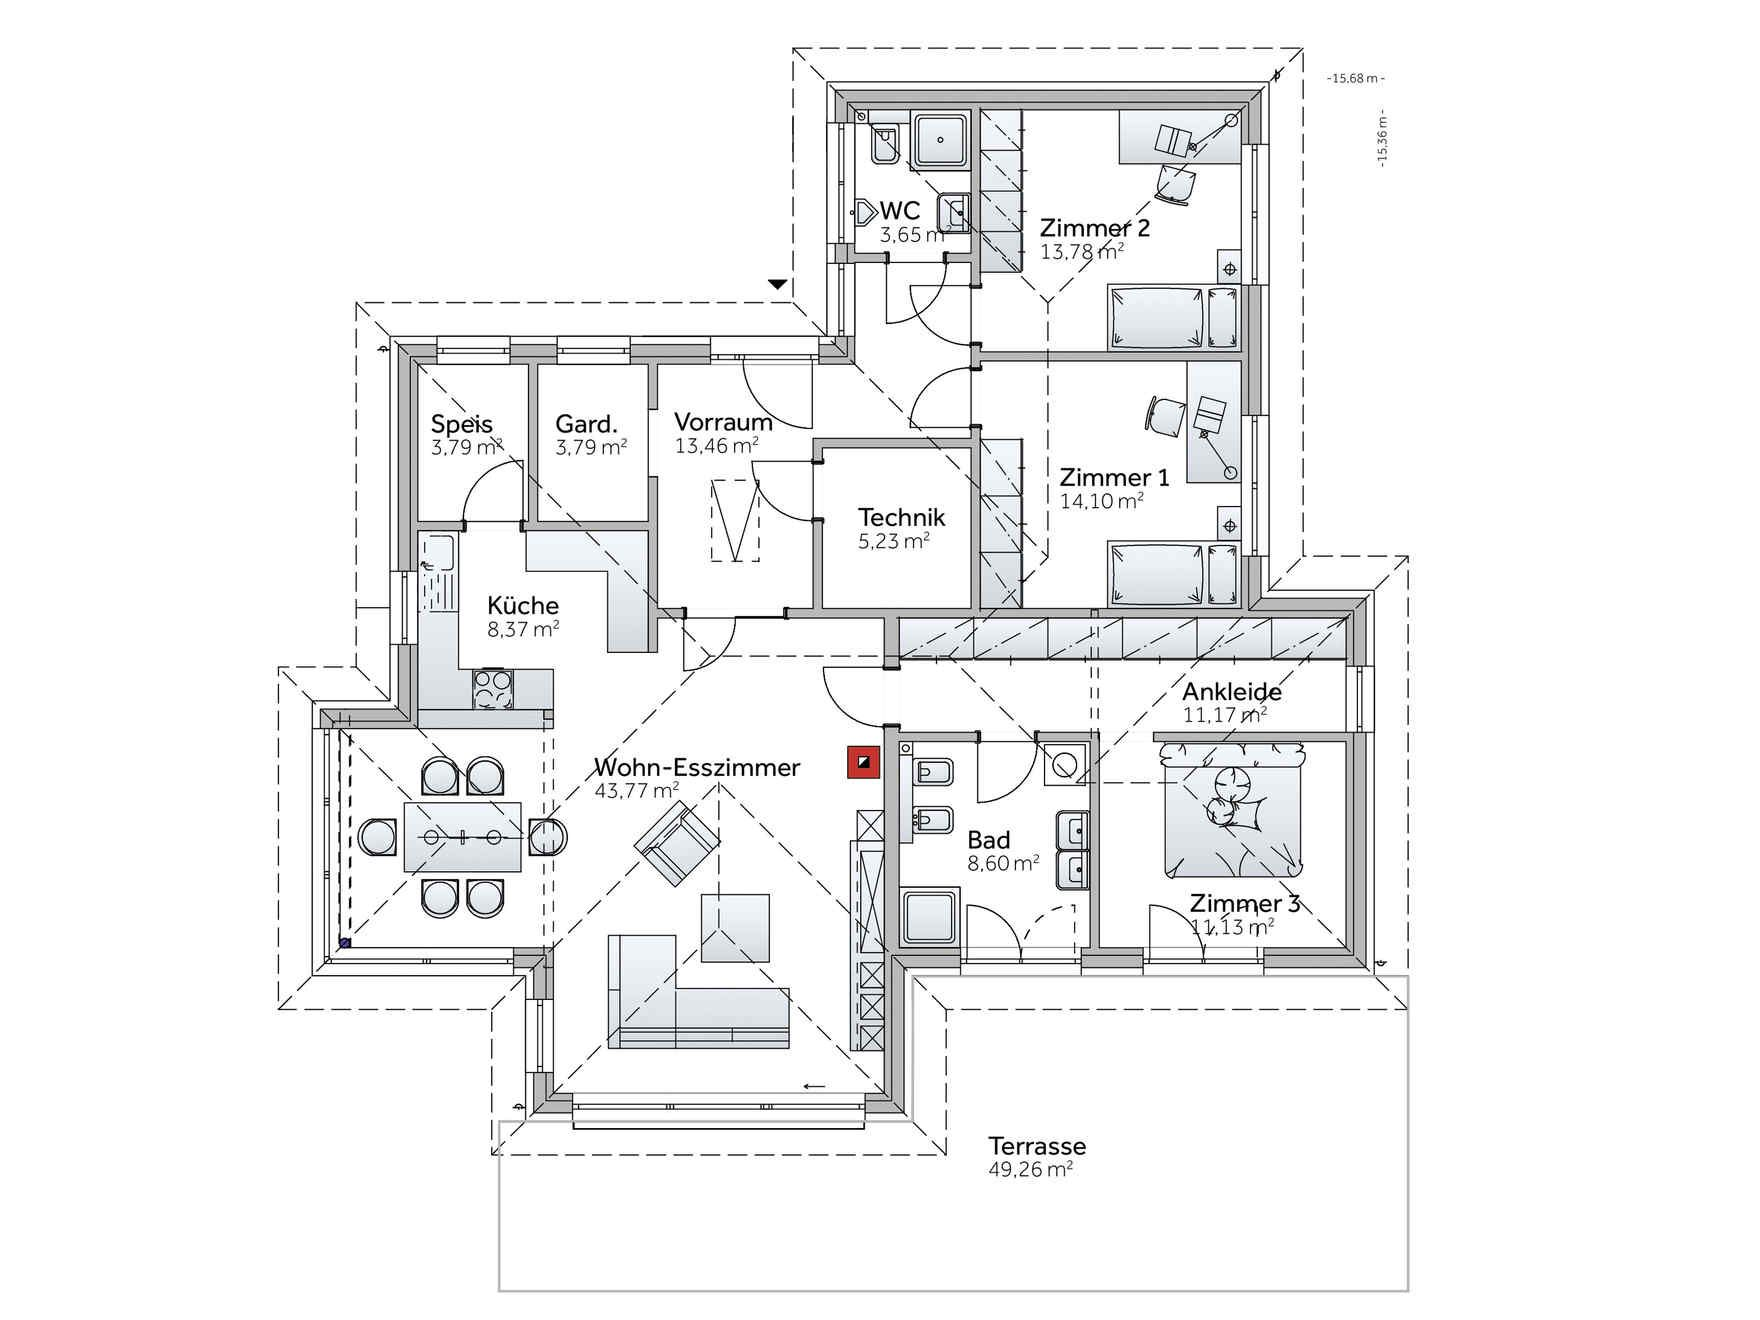 Fertighaus grundrisse  Fertighaus Bungalow S141 | Architektur | Pinterest | Fertighaus ...